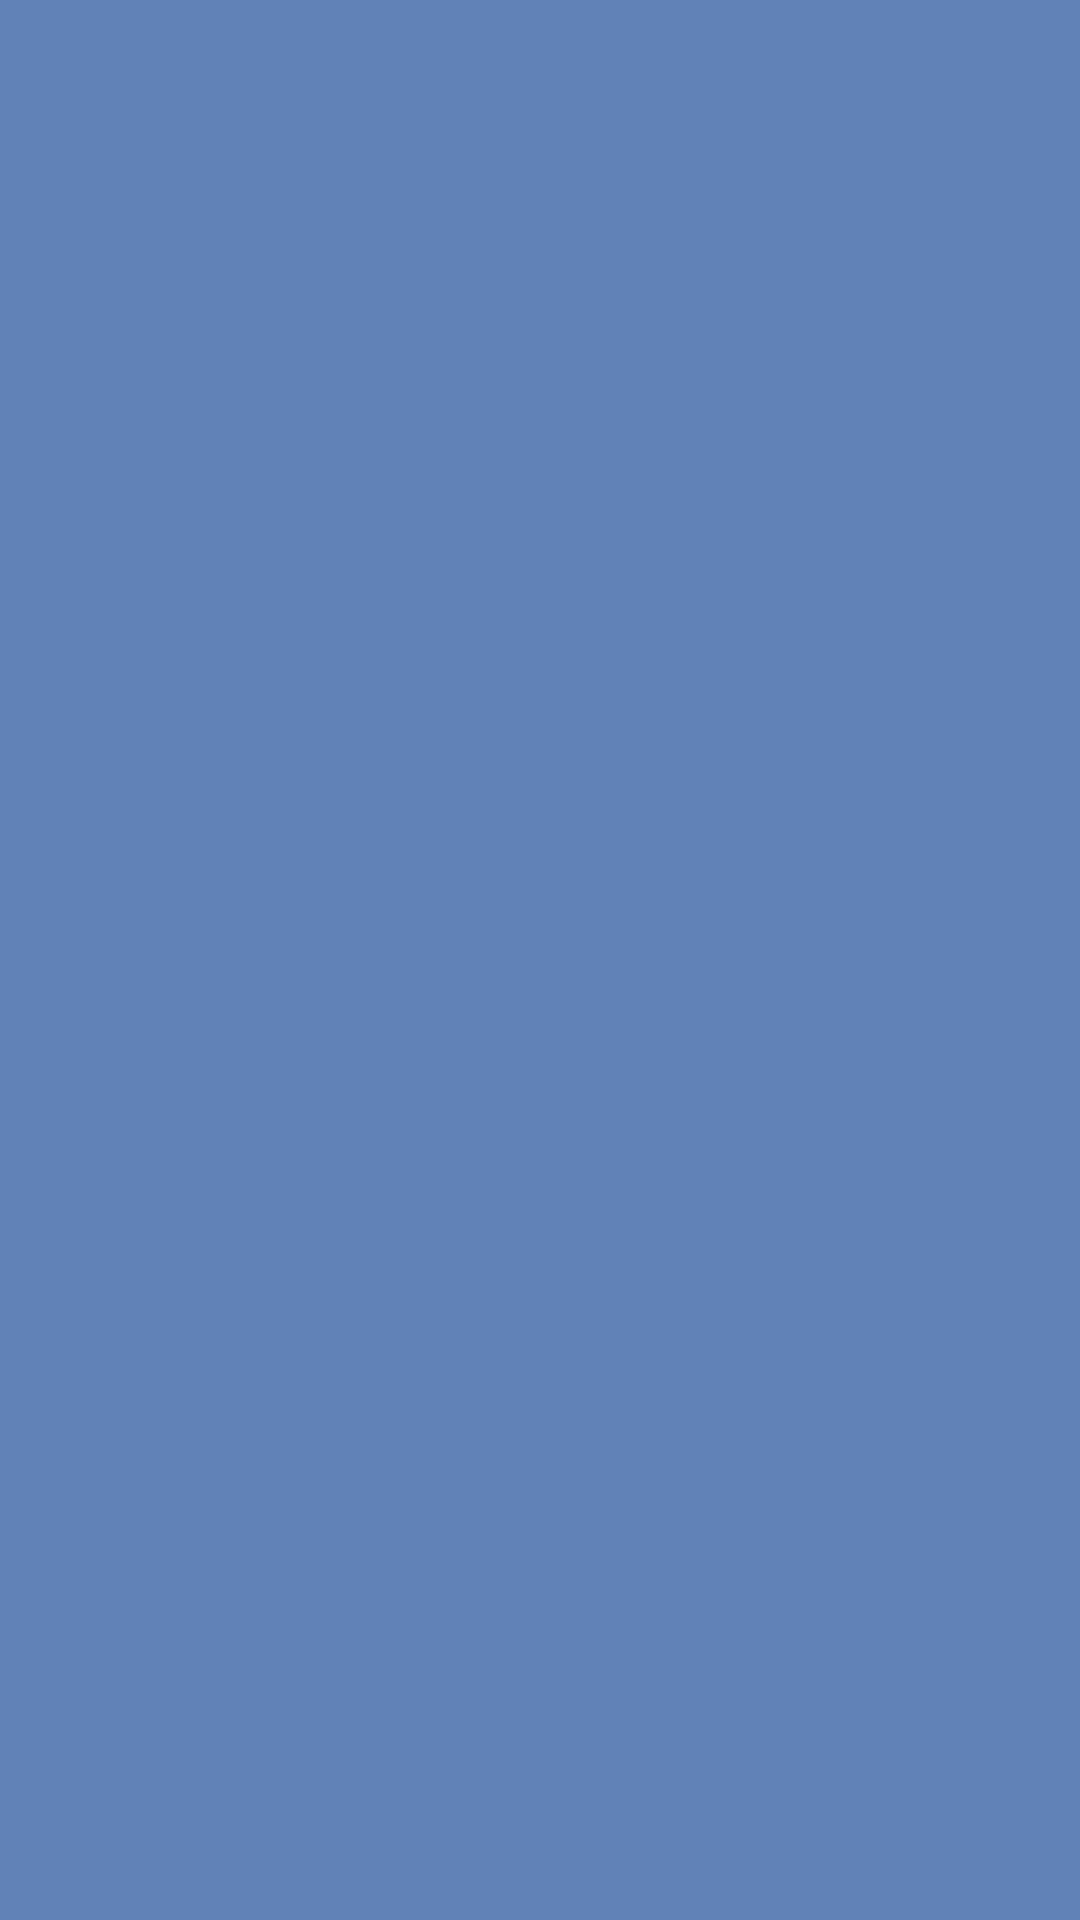 1080x1920 Glaucous Solid Color Background